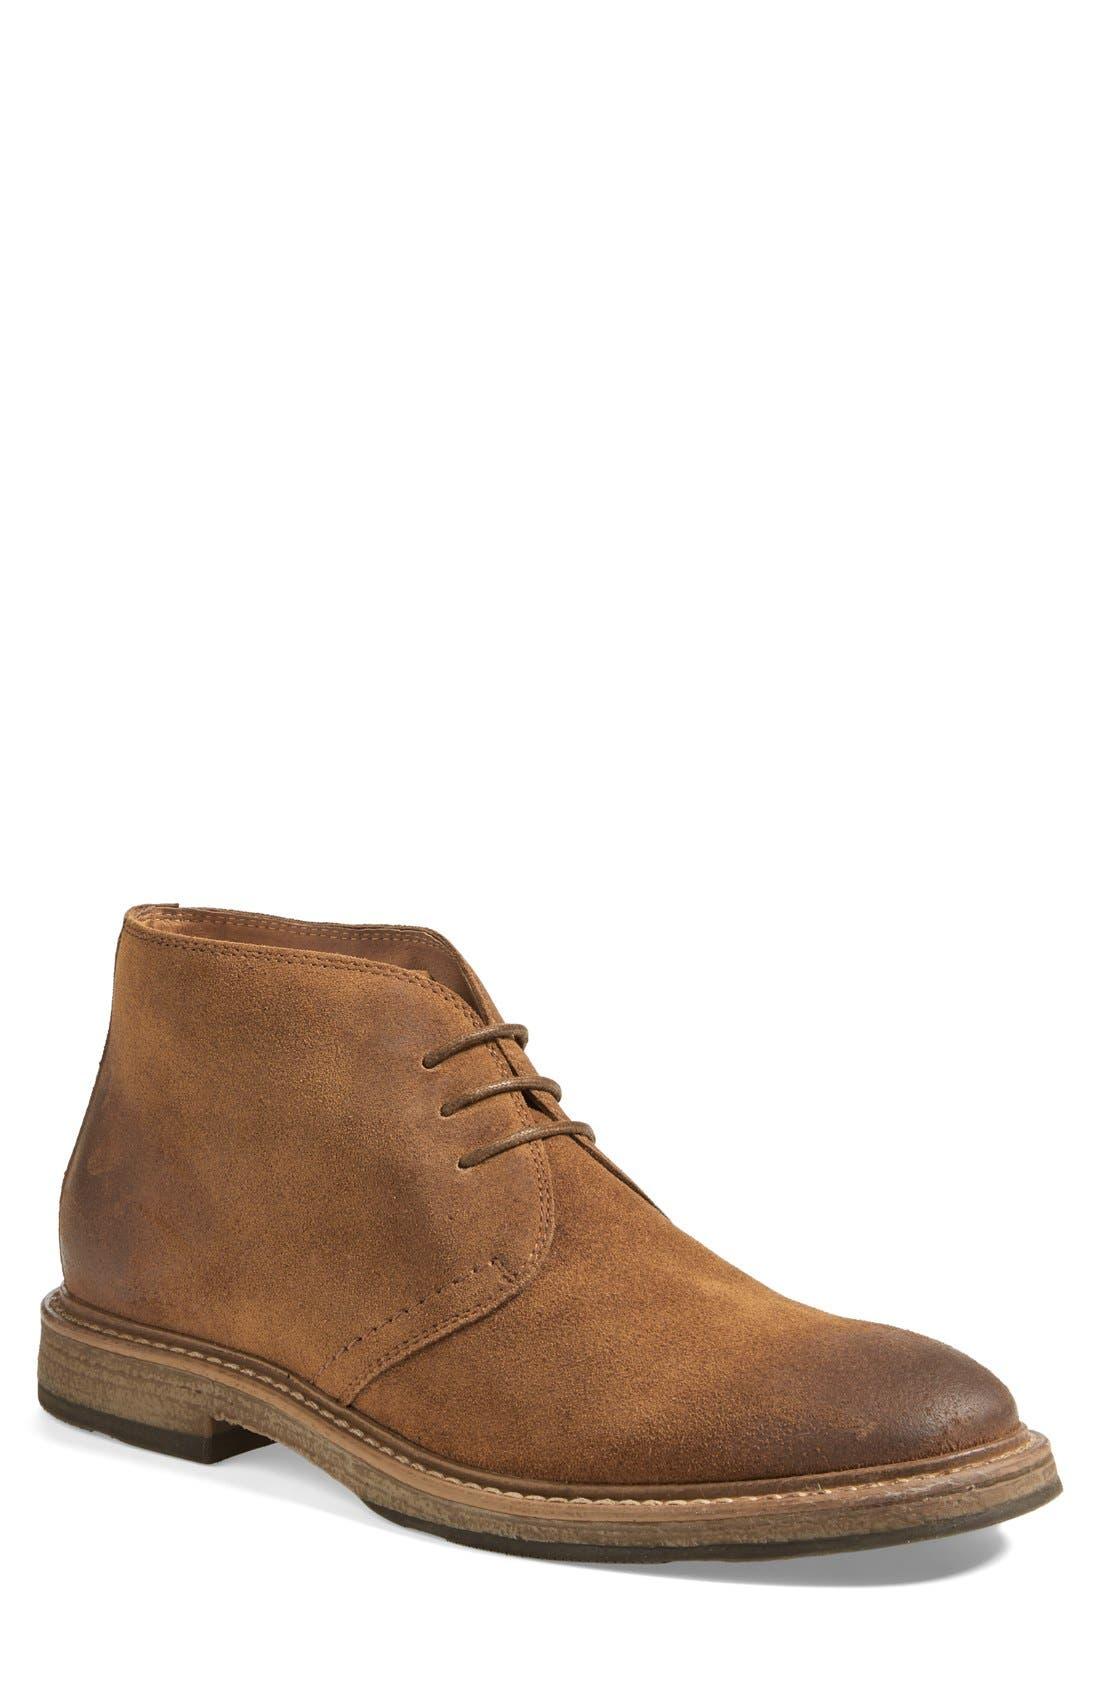 Alternate Image 1 Selected - 1901 'Canyon' Chukka Boot (Men)